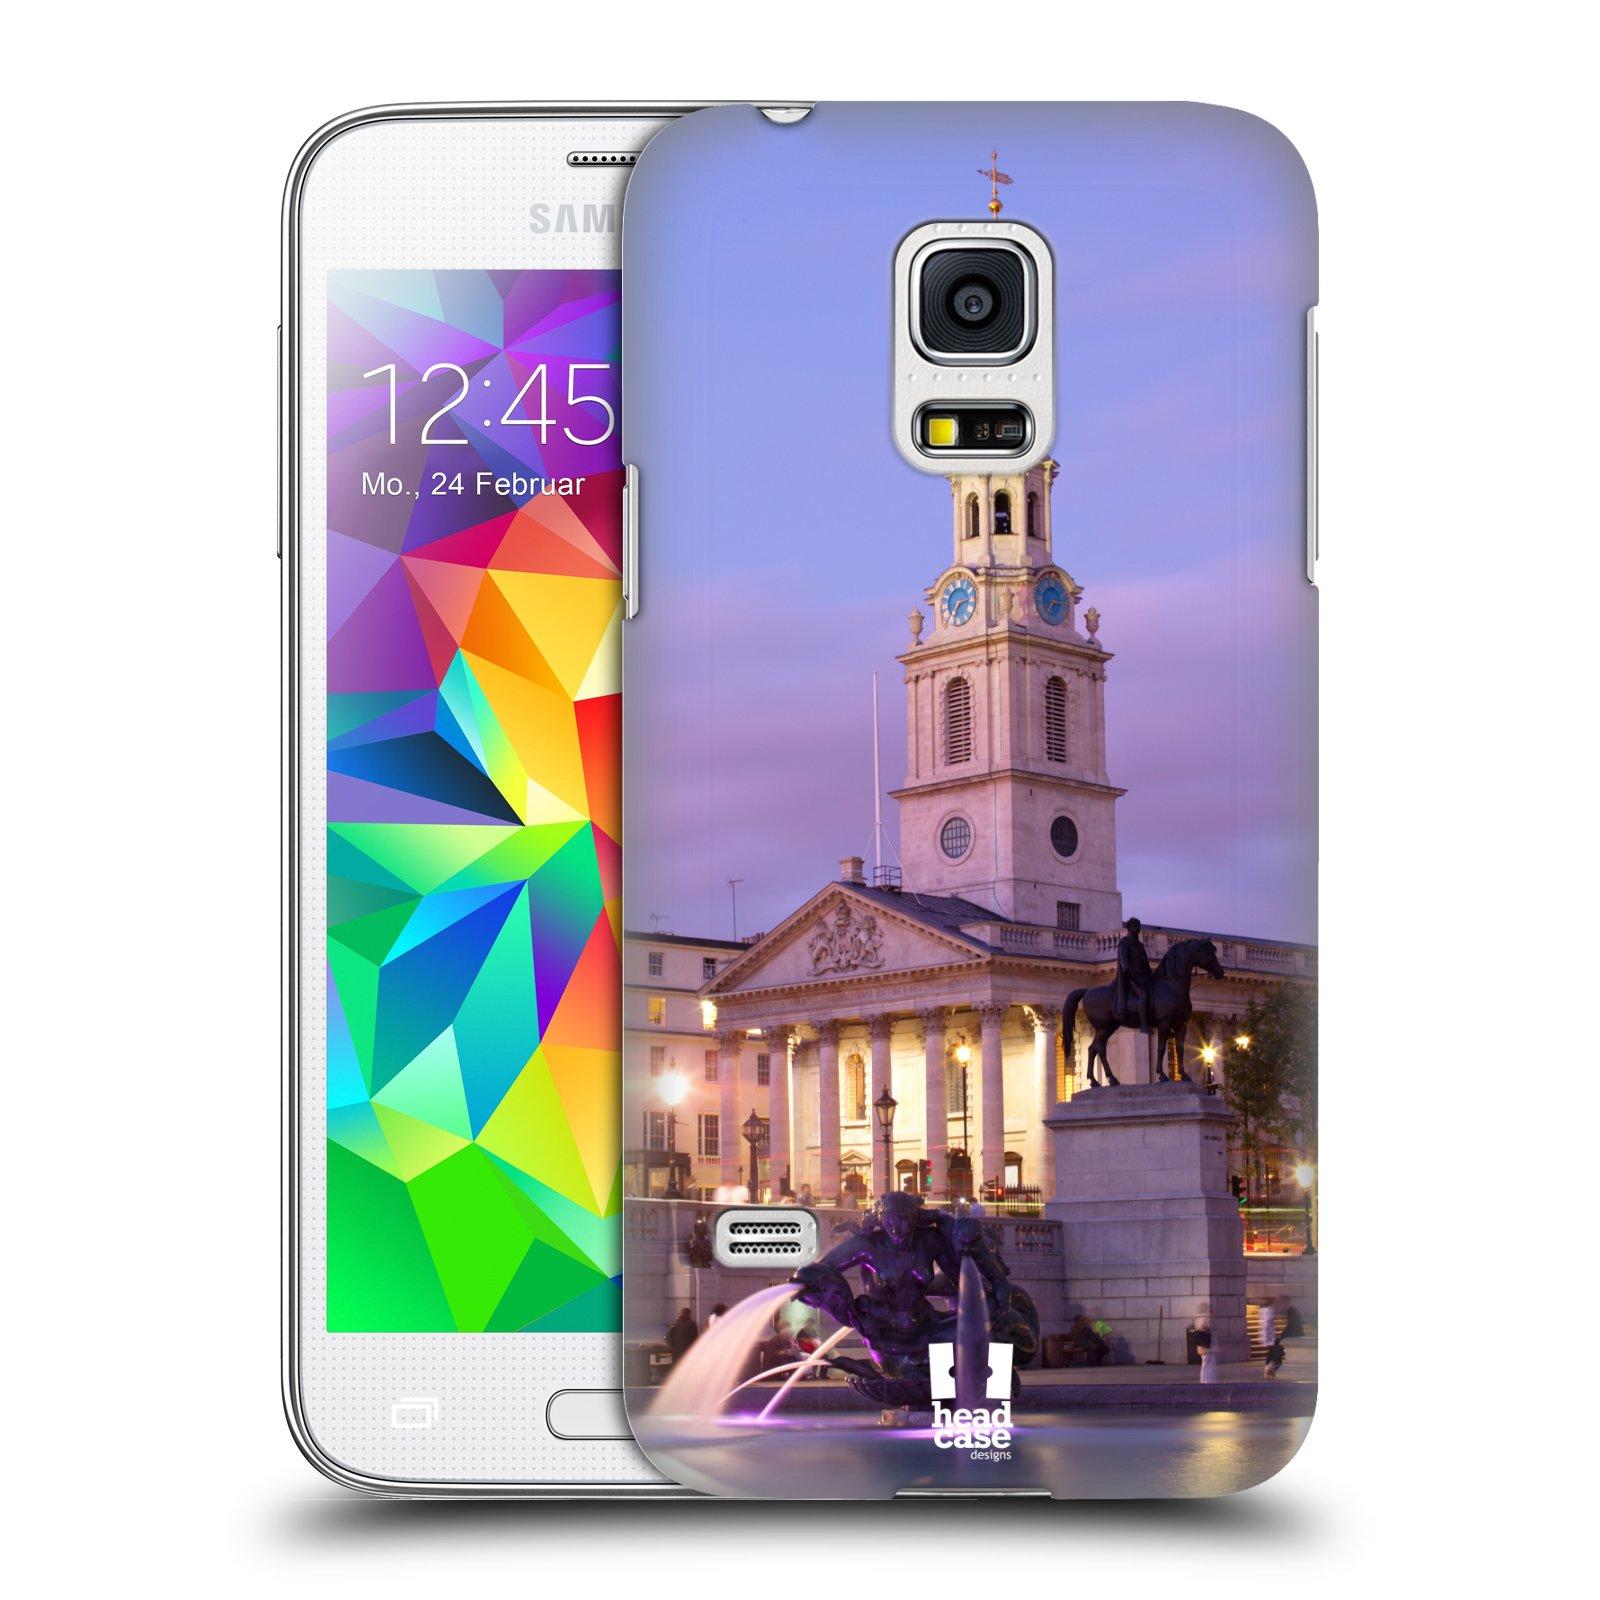 HEAD CASE plastový obal na mobil SAMSUNG Galaxy S5 MINI / S5 MINI DUOS vzor Města foto náměstí ANGLIE, LONDÝN, TRAFALGAR VĚŽ HODINY